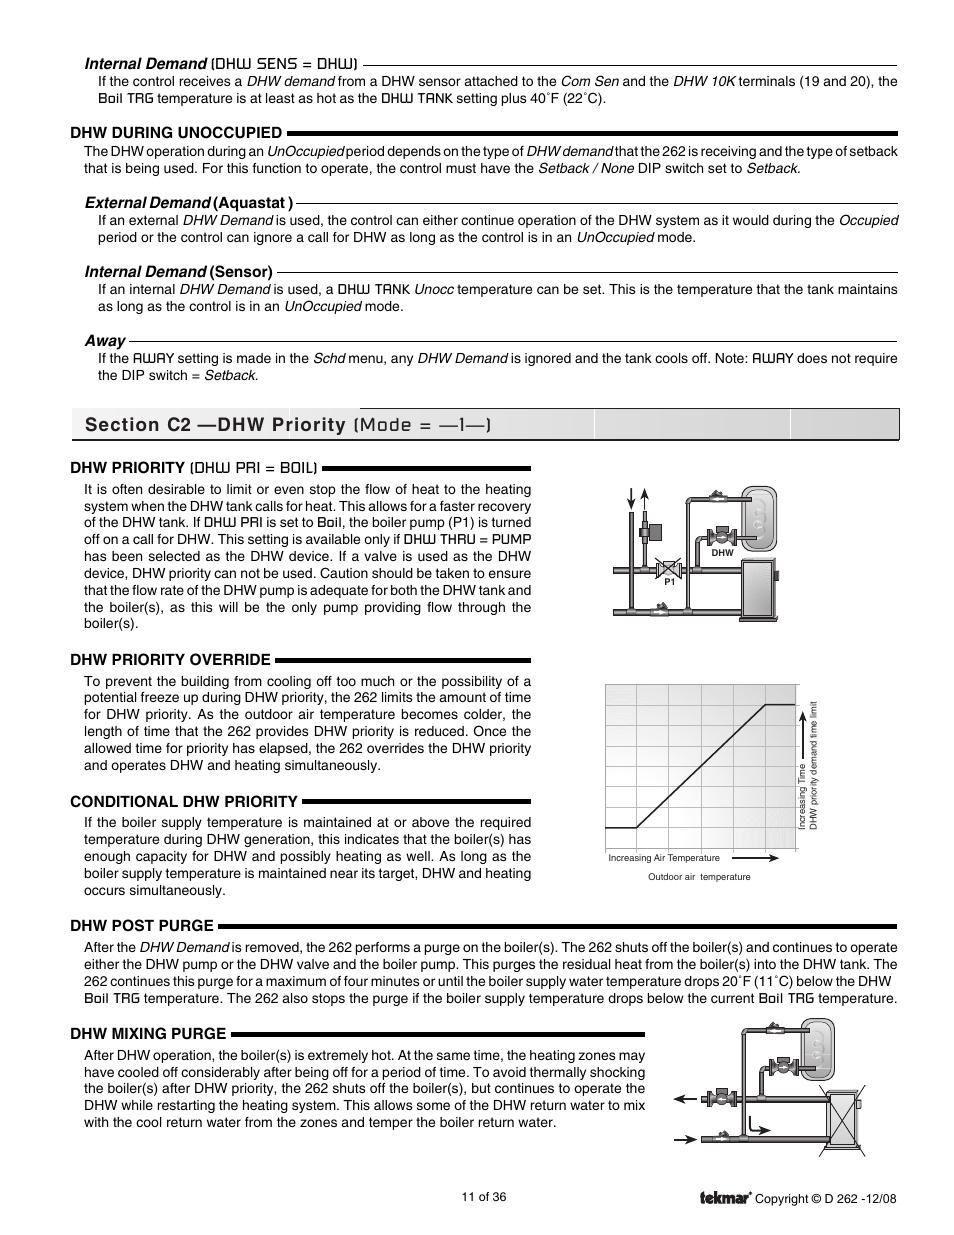 Awesome Kedu Zh Hc 3 Switches Wiring Schematics Inspiration - Wiring ...